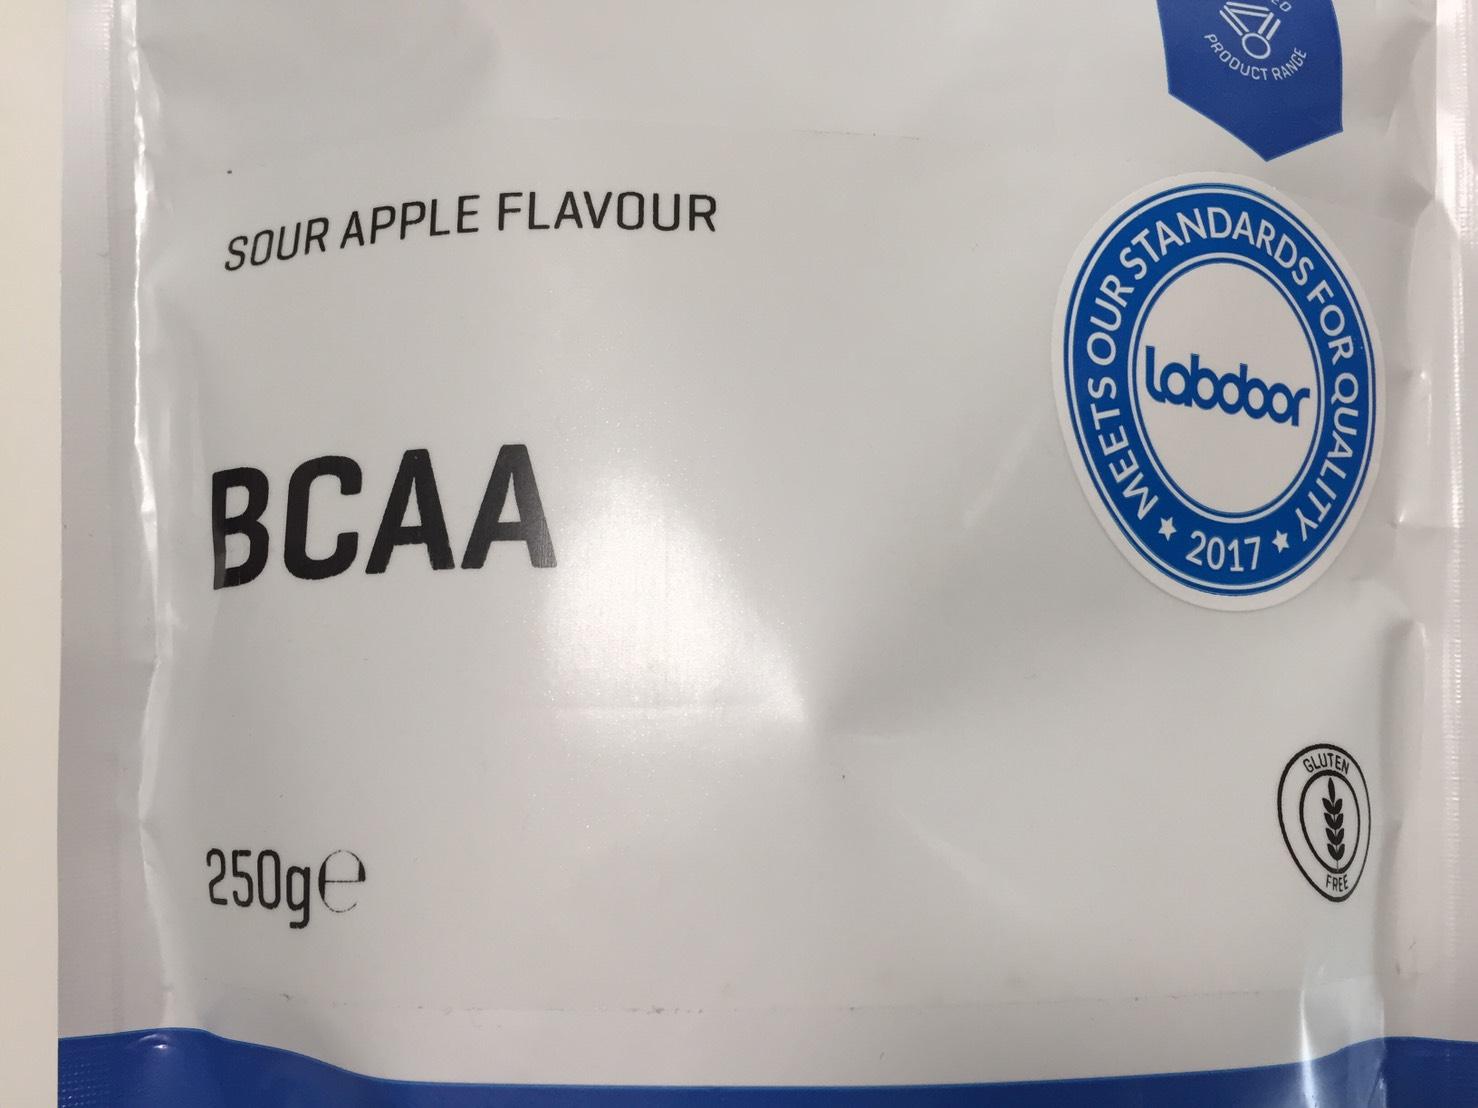 BCAA「サワーアップル味(SOUR APPLE FLAVOUR)」